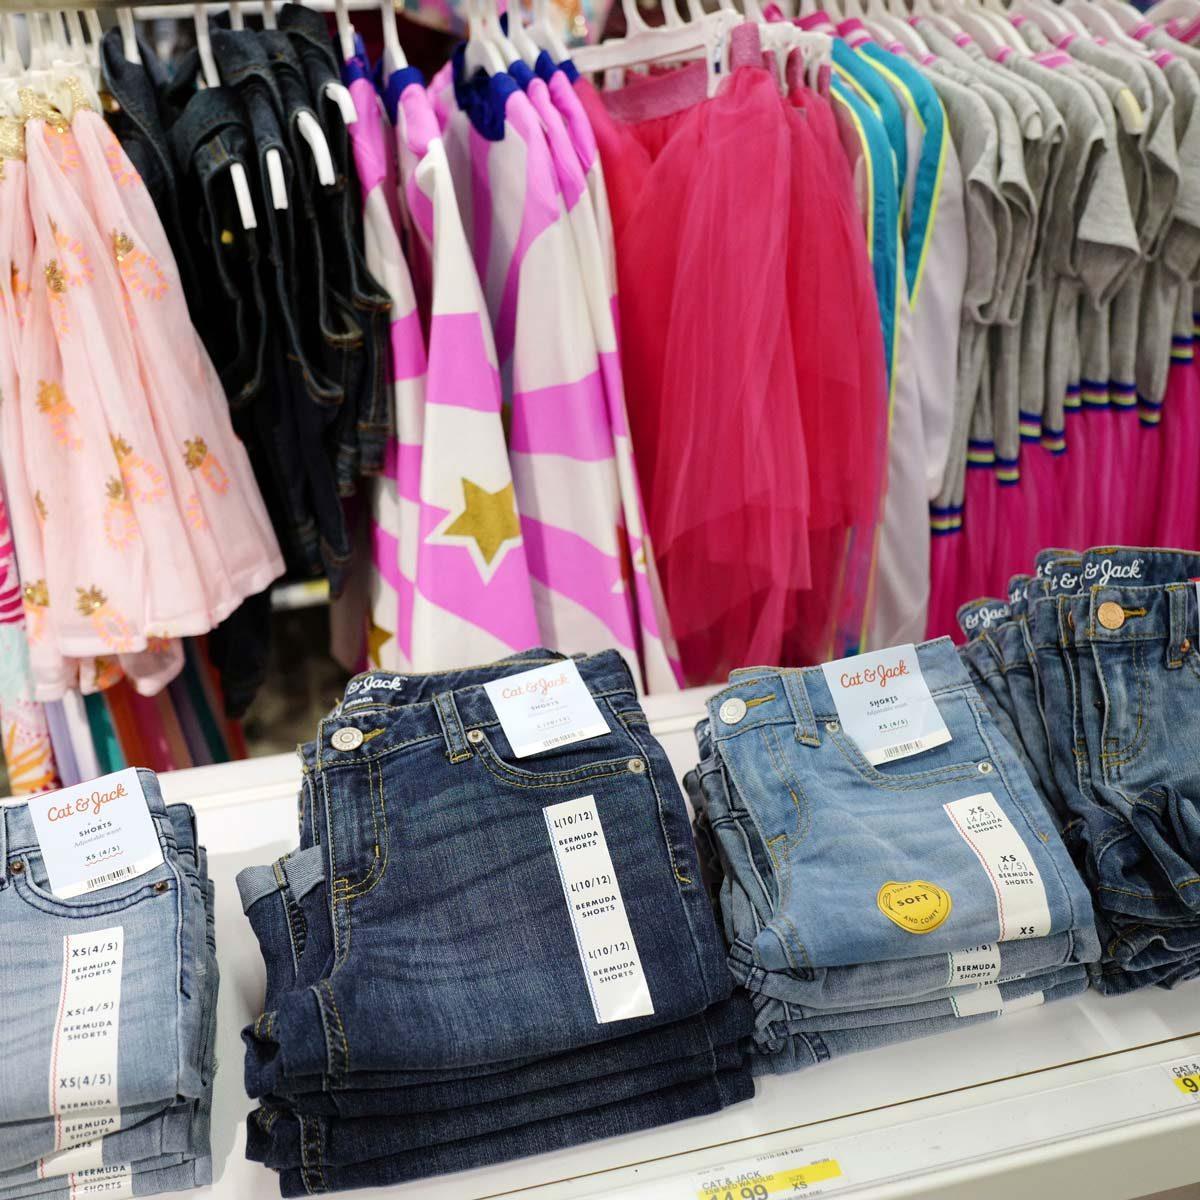 Clothing-display-at-a-Target-store